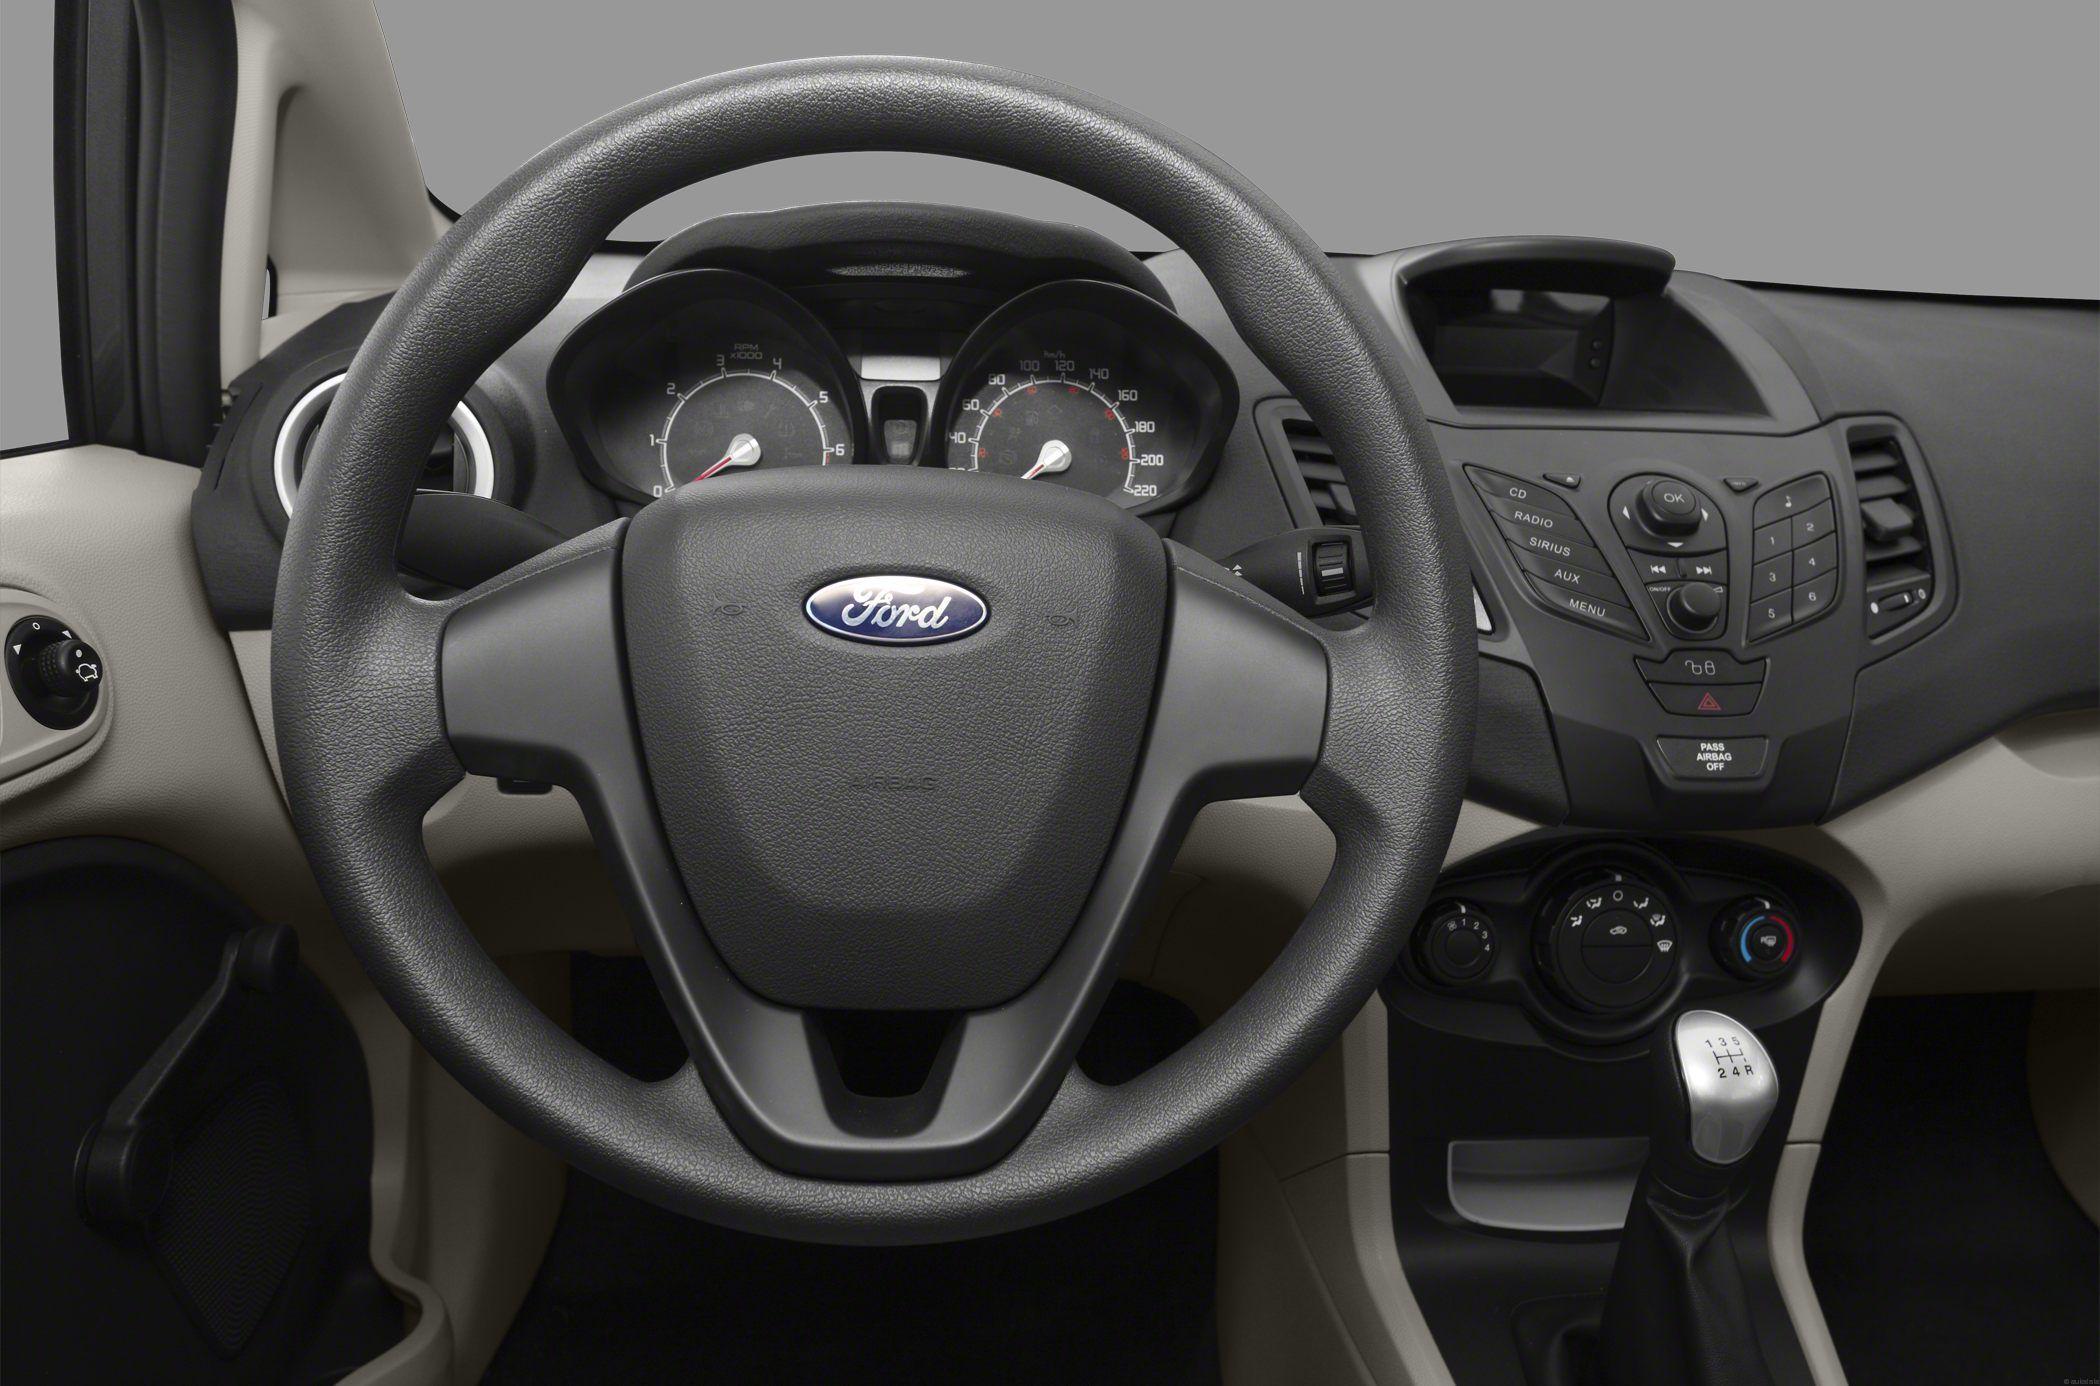 2012 Ford Fiesta Dashboard Google Search Ford Fiesta Ford Fiesta